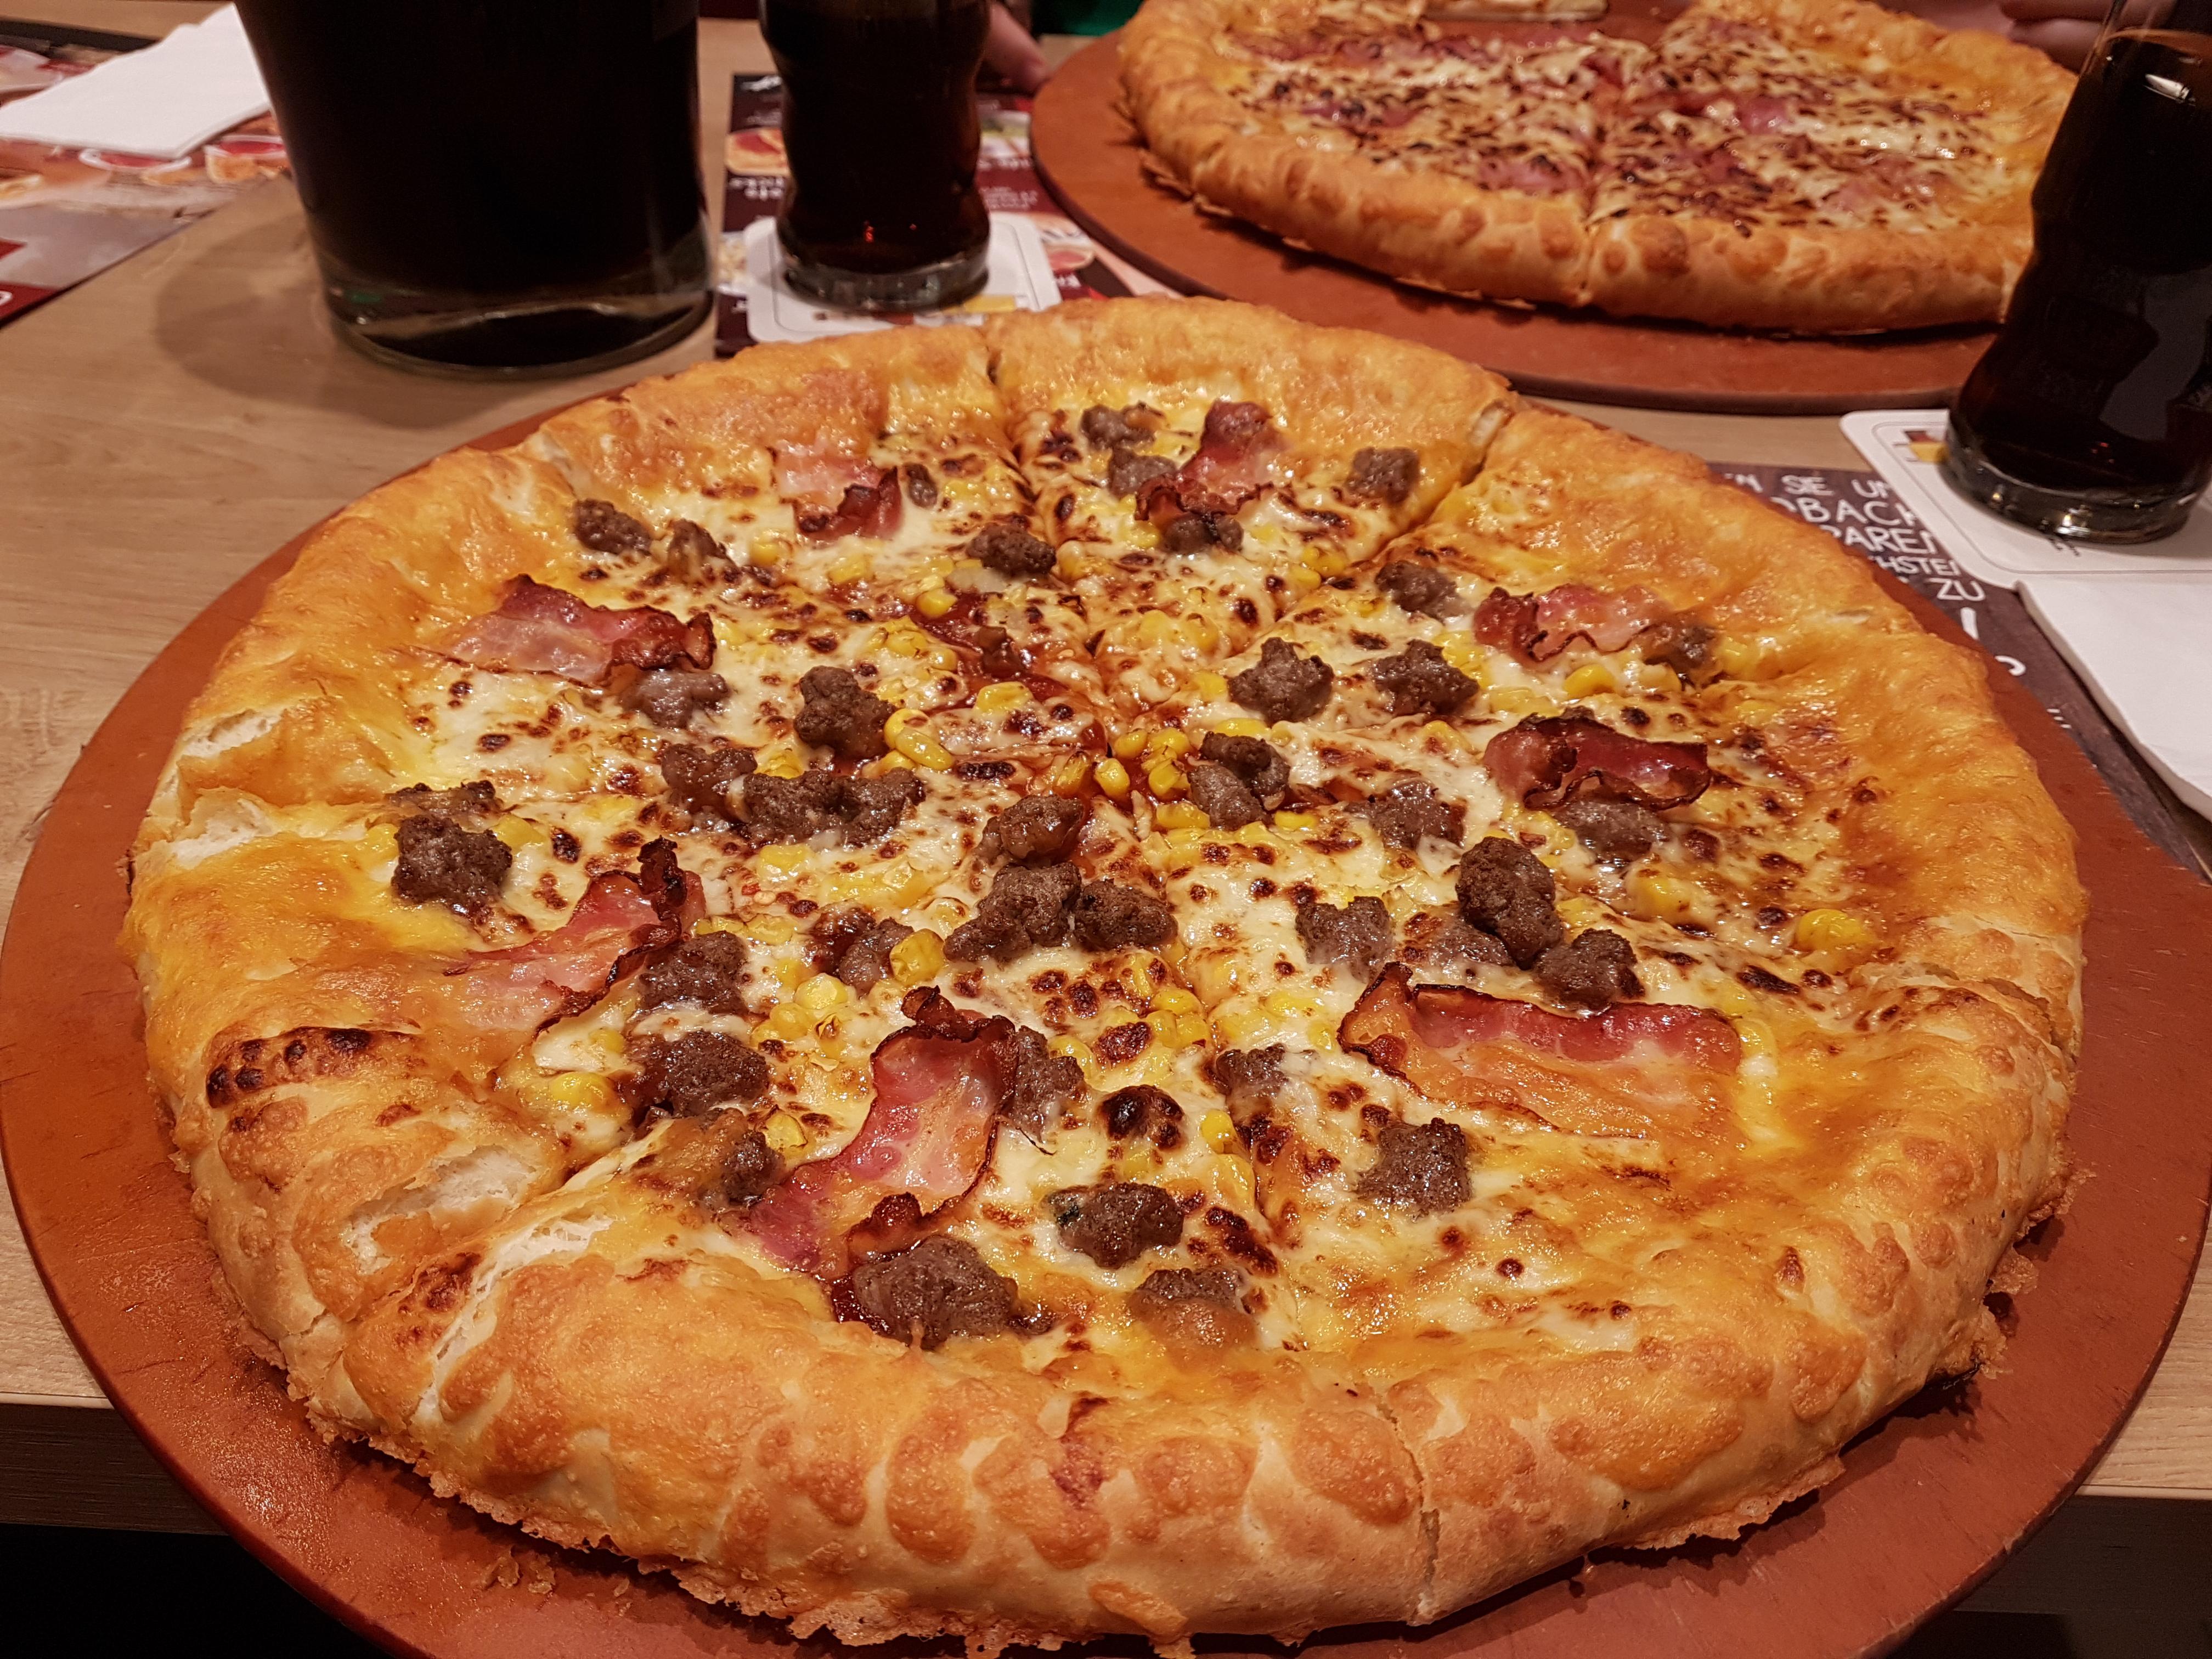 https://foodloader.net/Holz_2017-11-09_Pizza_Hut_Golden_Cheesy_Crust_BBQ_Lovers.jpg